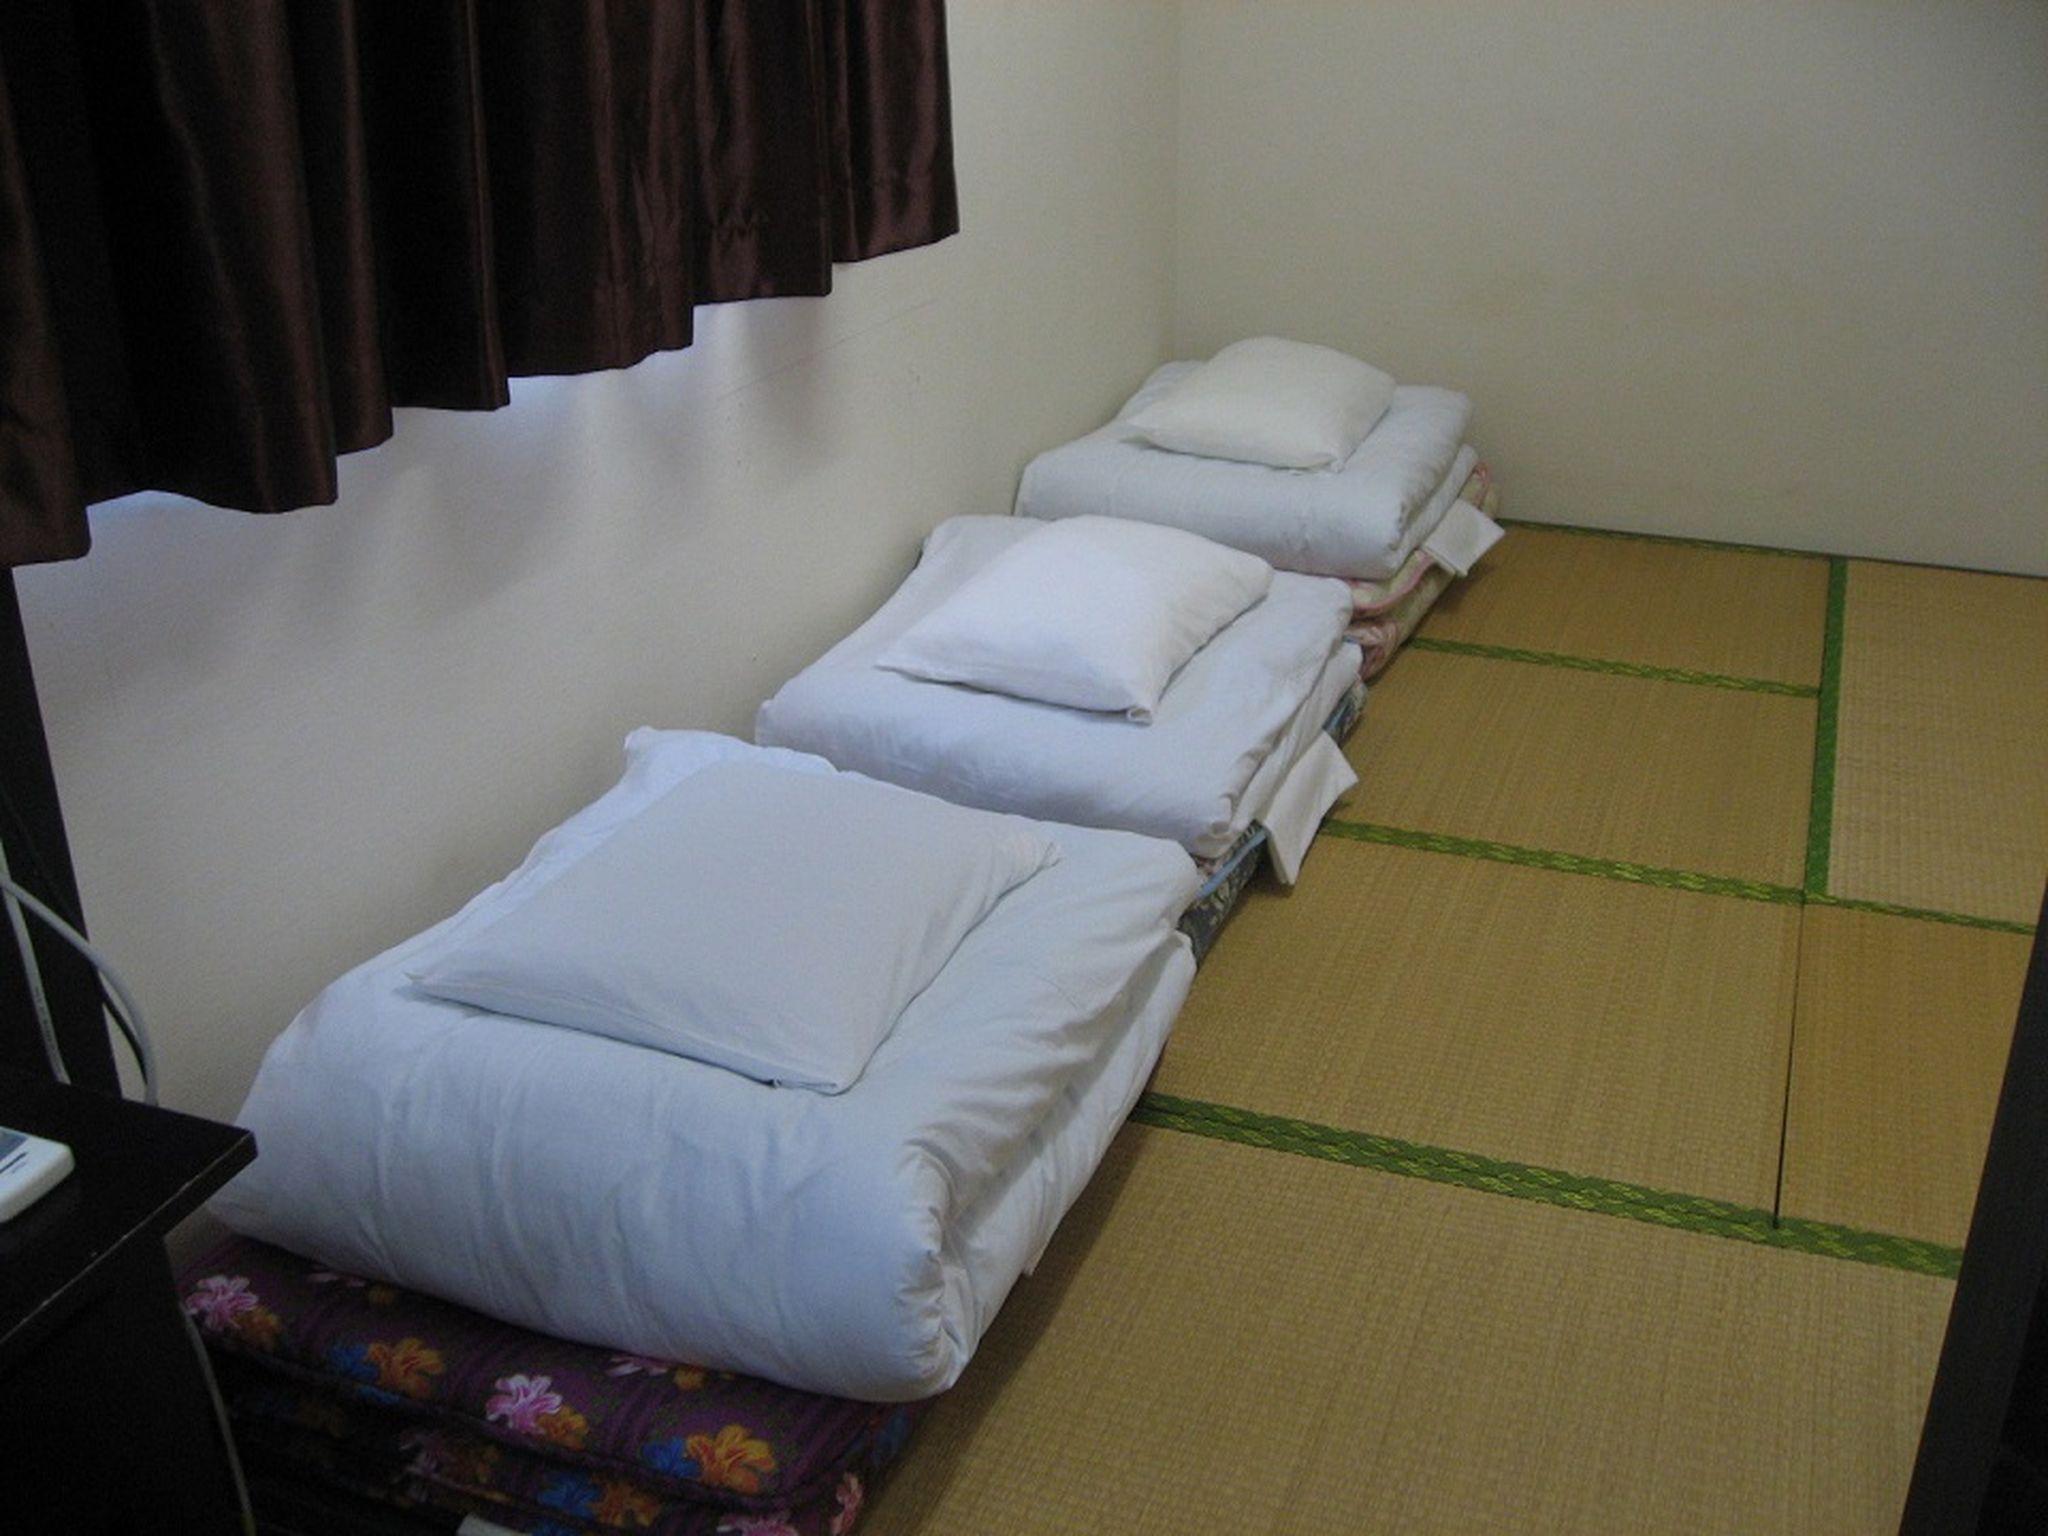 Hotel Southern Village Okinawa, Kitanakagusuku